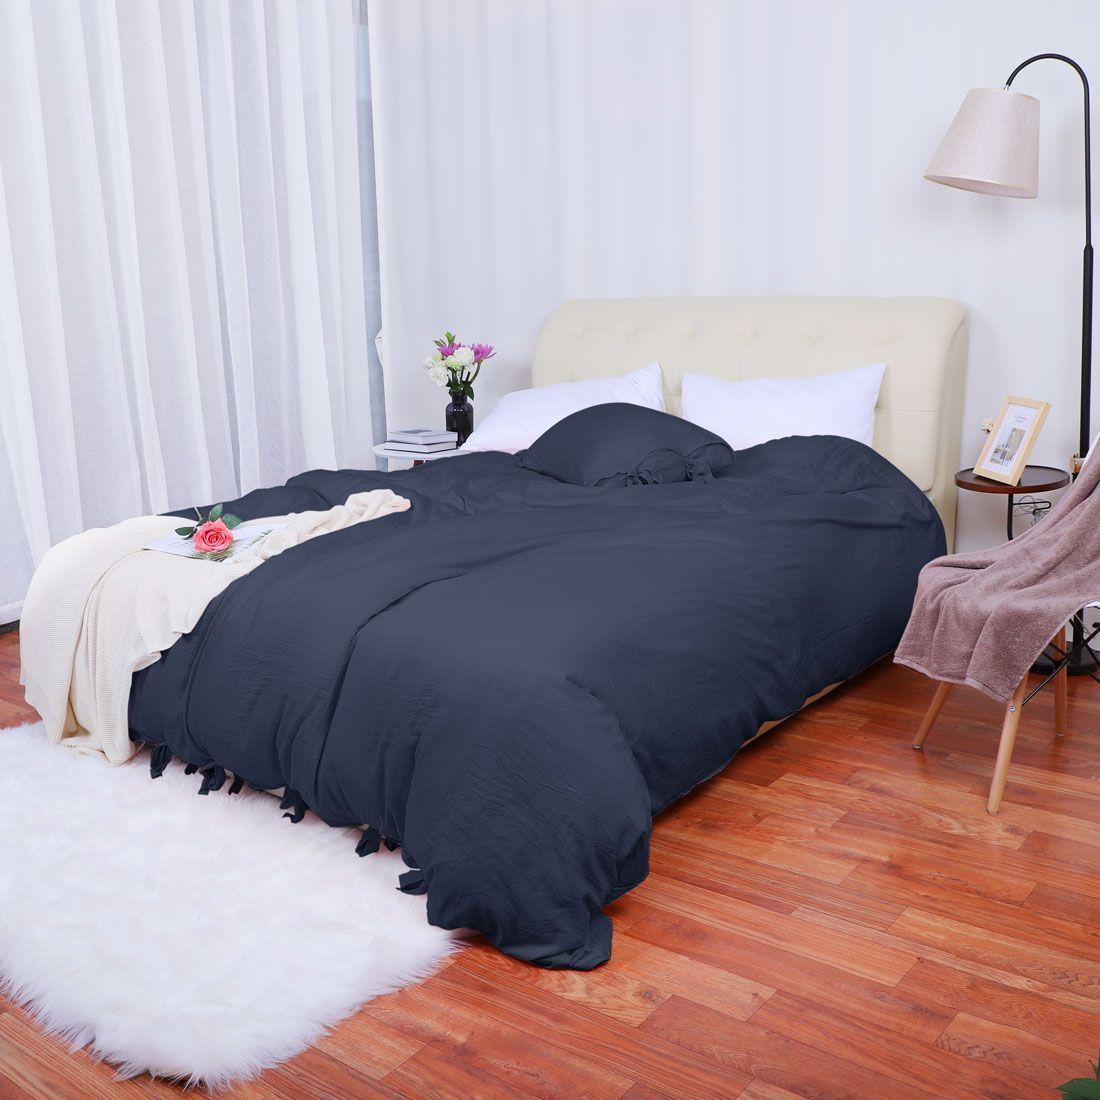 Home in 2020 Comforter duvet cover, Cotton bedding